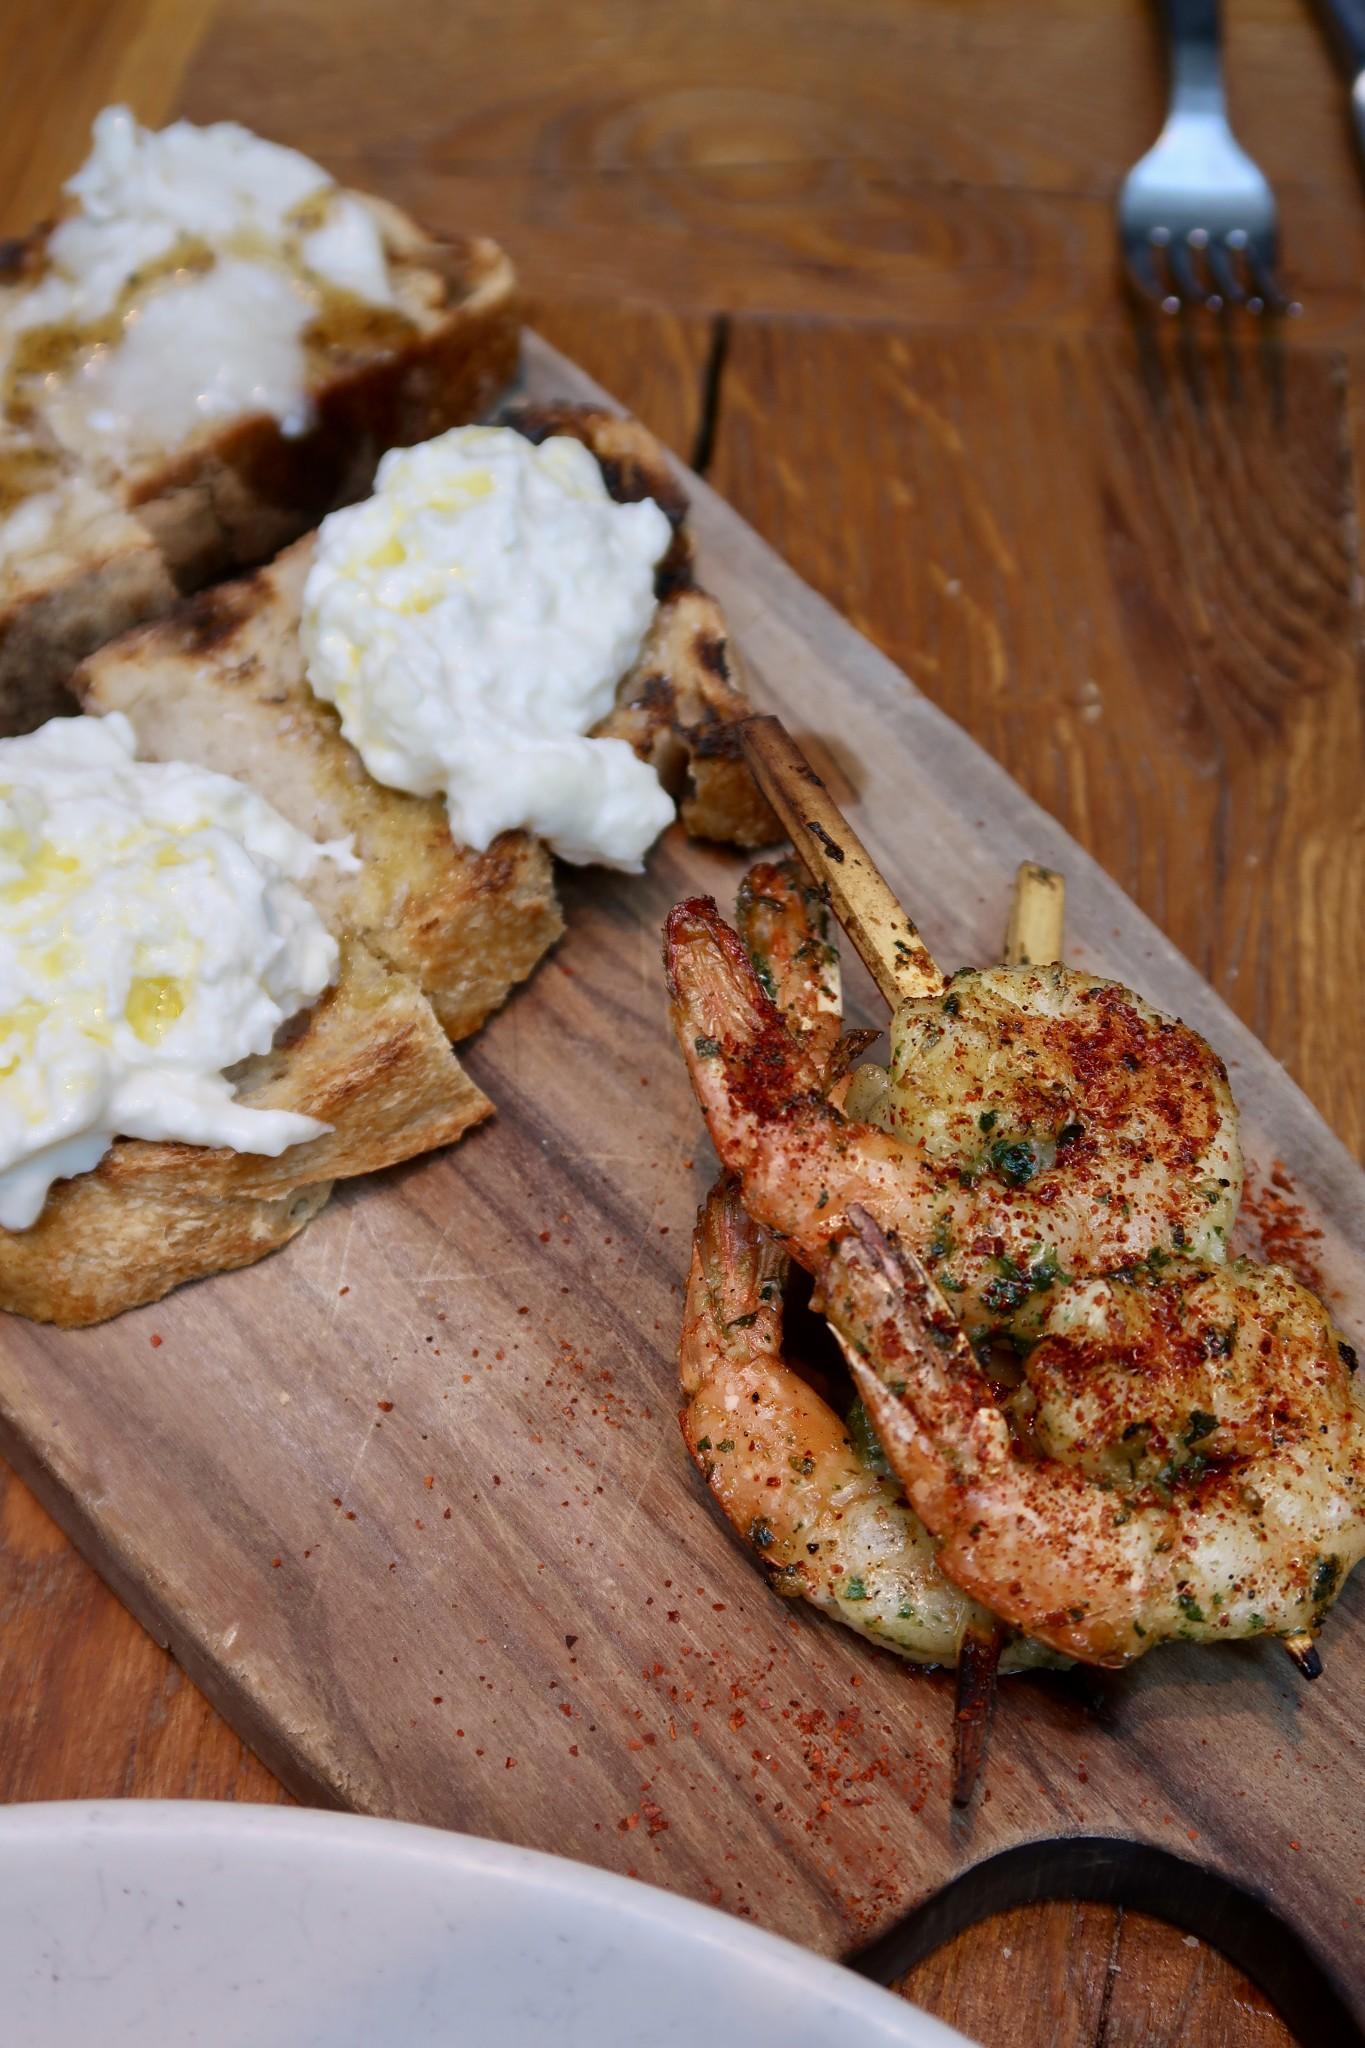 terra eataly boston, beautiful restaurants in boston, the-alyst.com